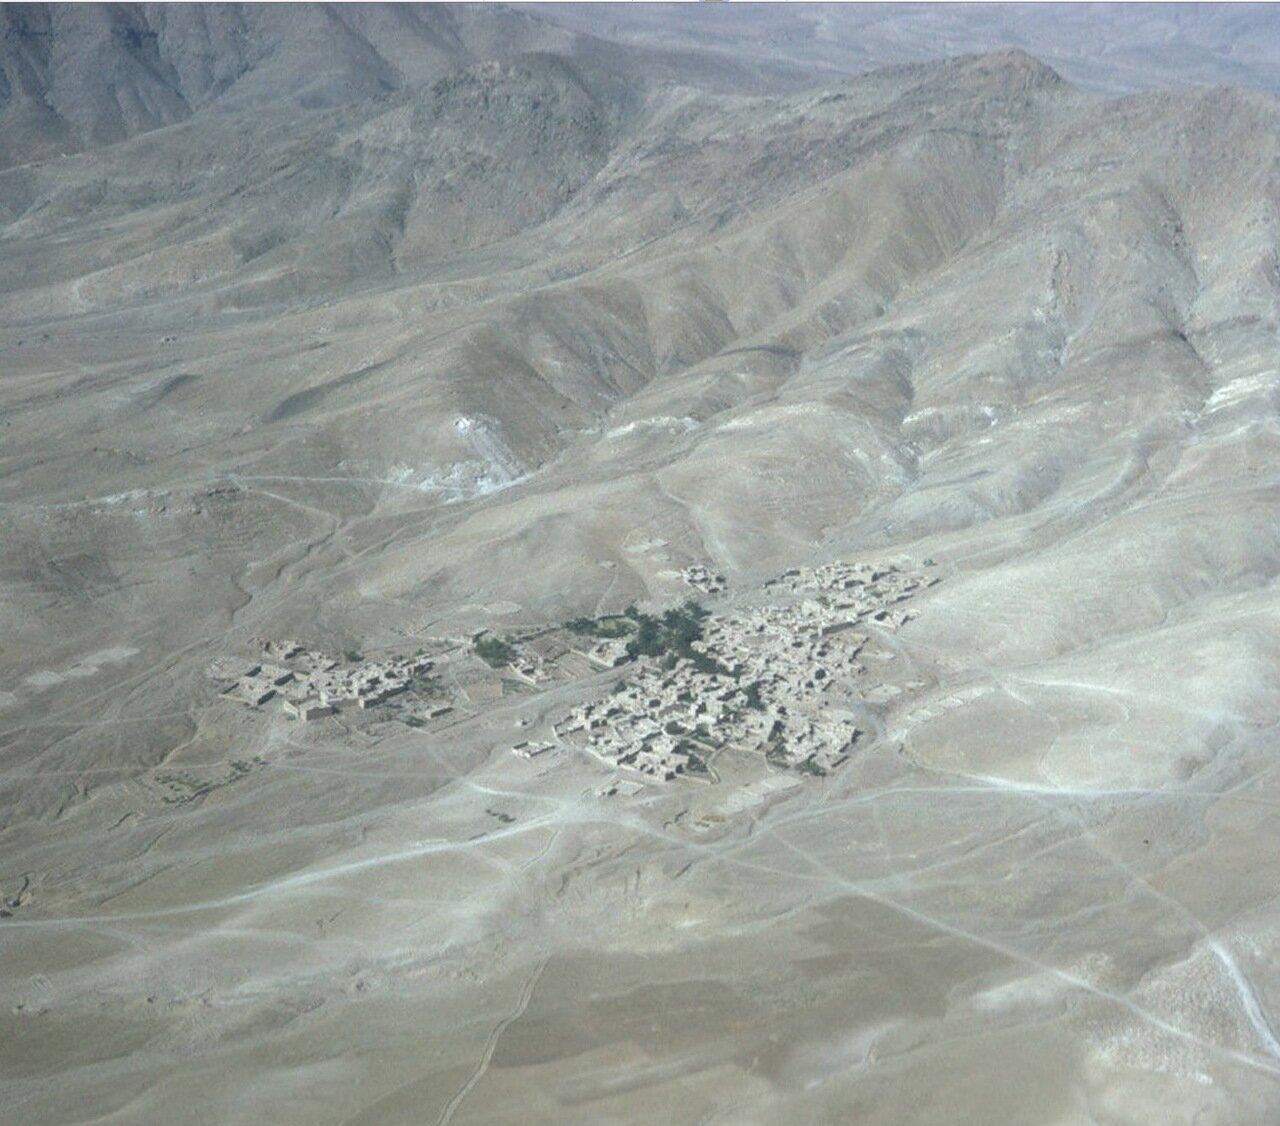 Аэрофотосъемка горного села